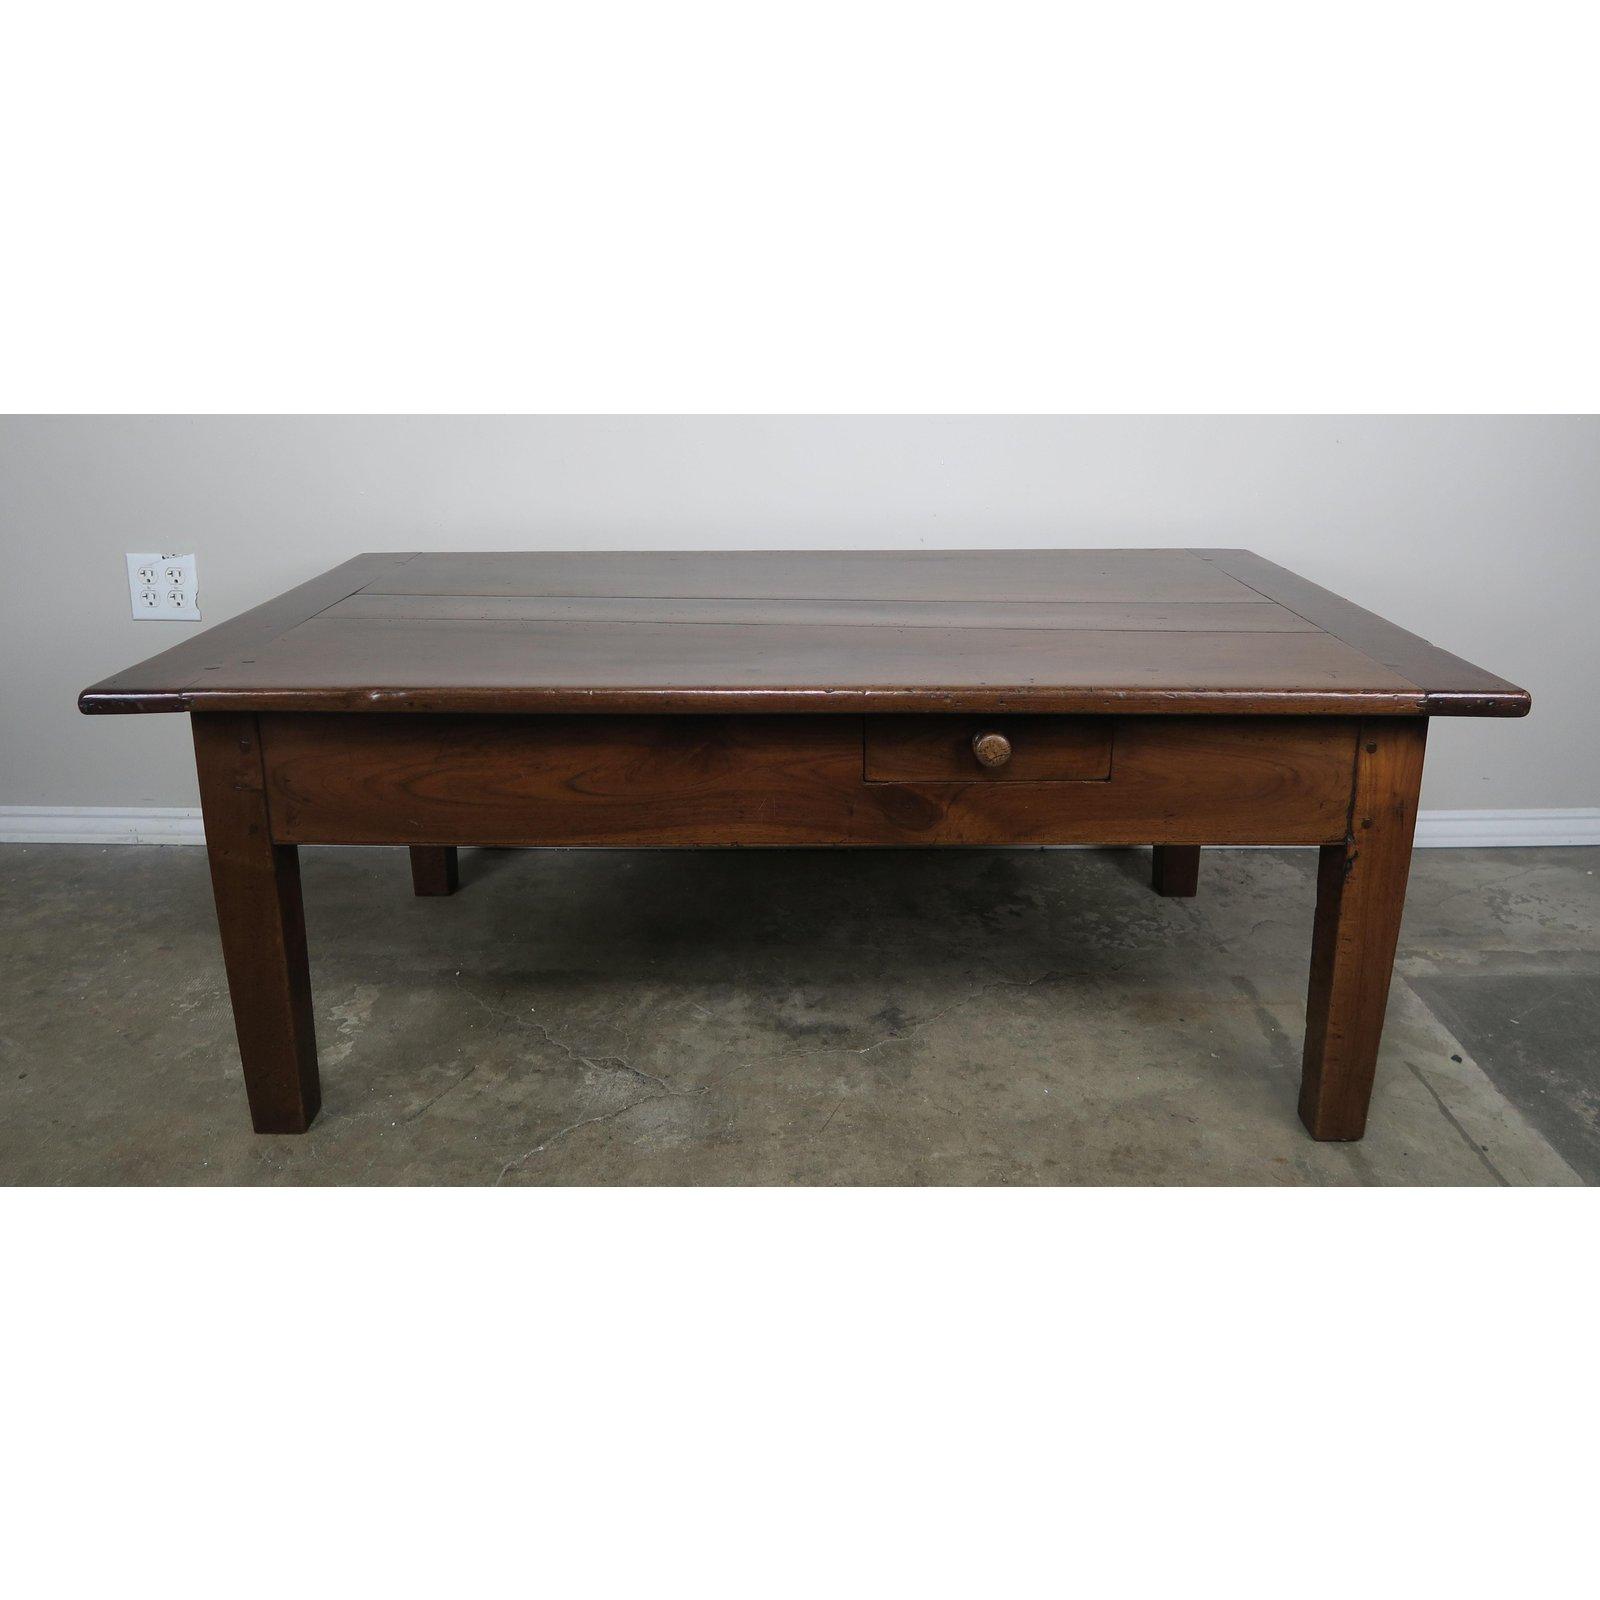 Walnut Coffee Table.19th Century English Walnut Coffee Table With Drawers